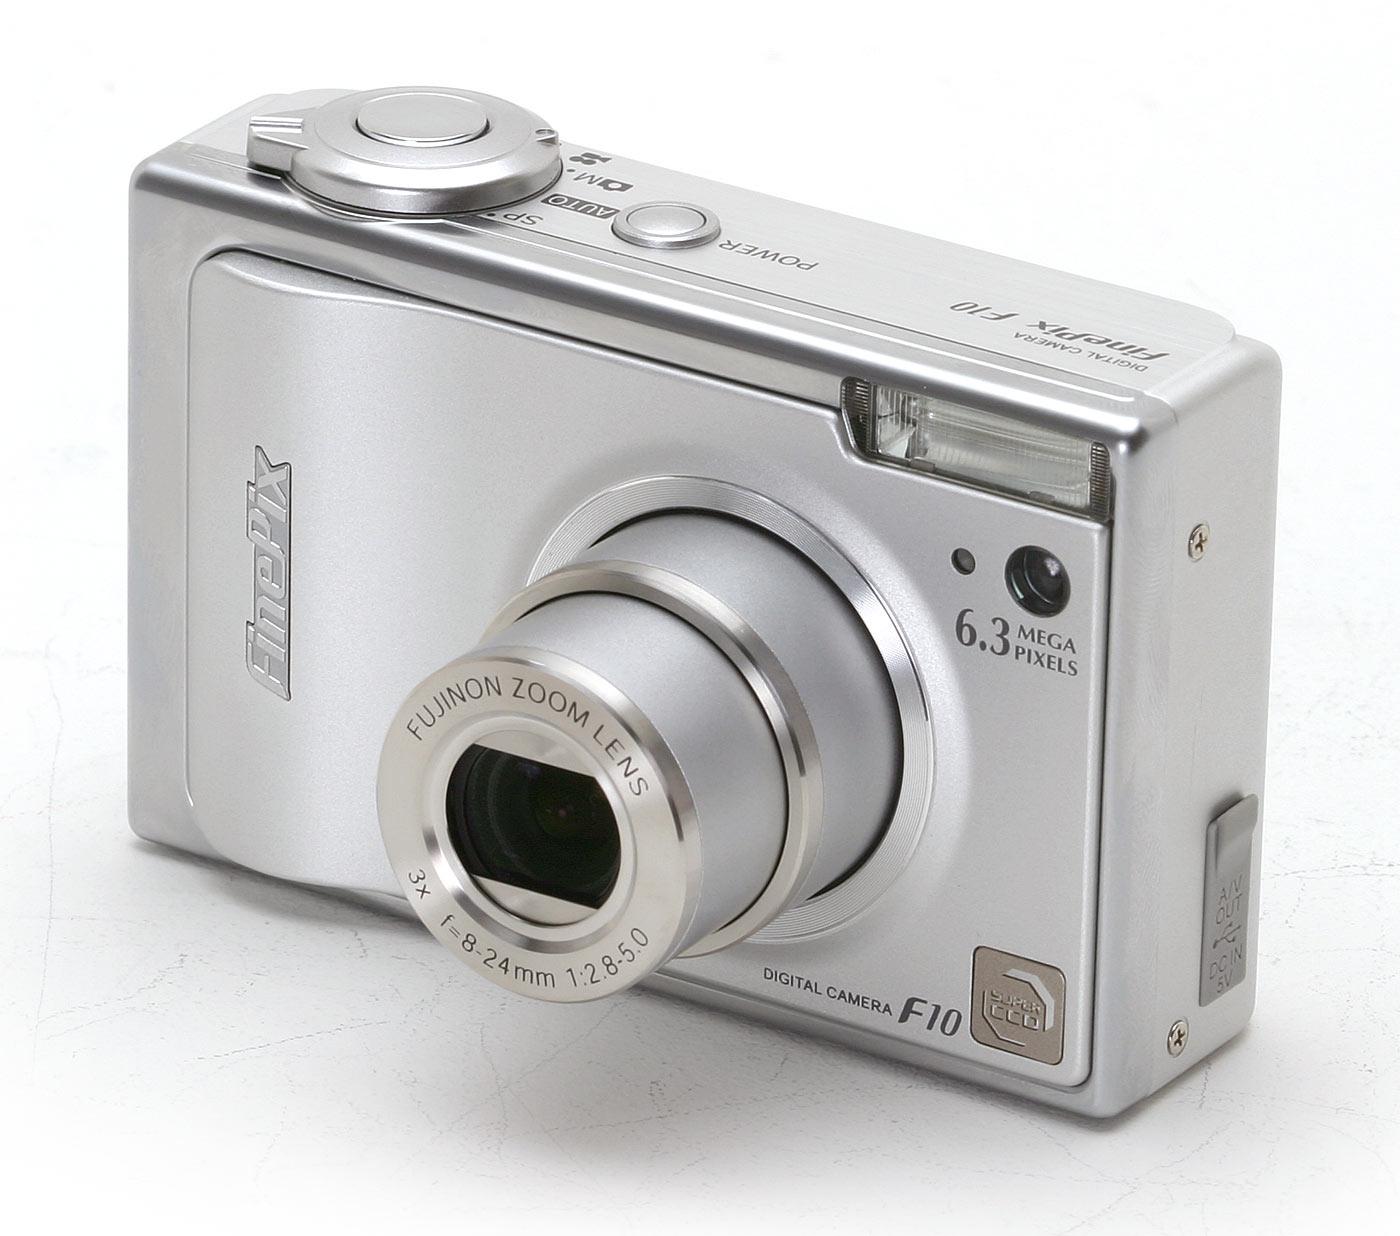 Fujifilm finepix f10 review digital photography review for Fujifilm finepix s5600 prix neuf